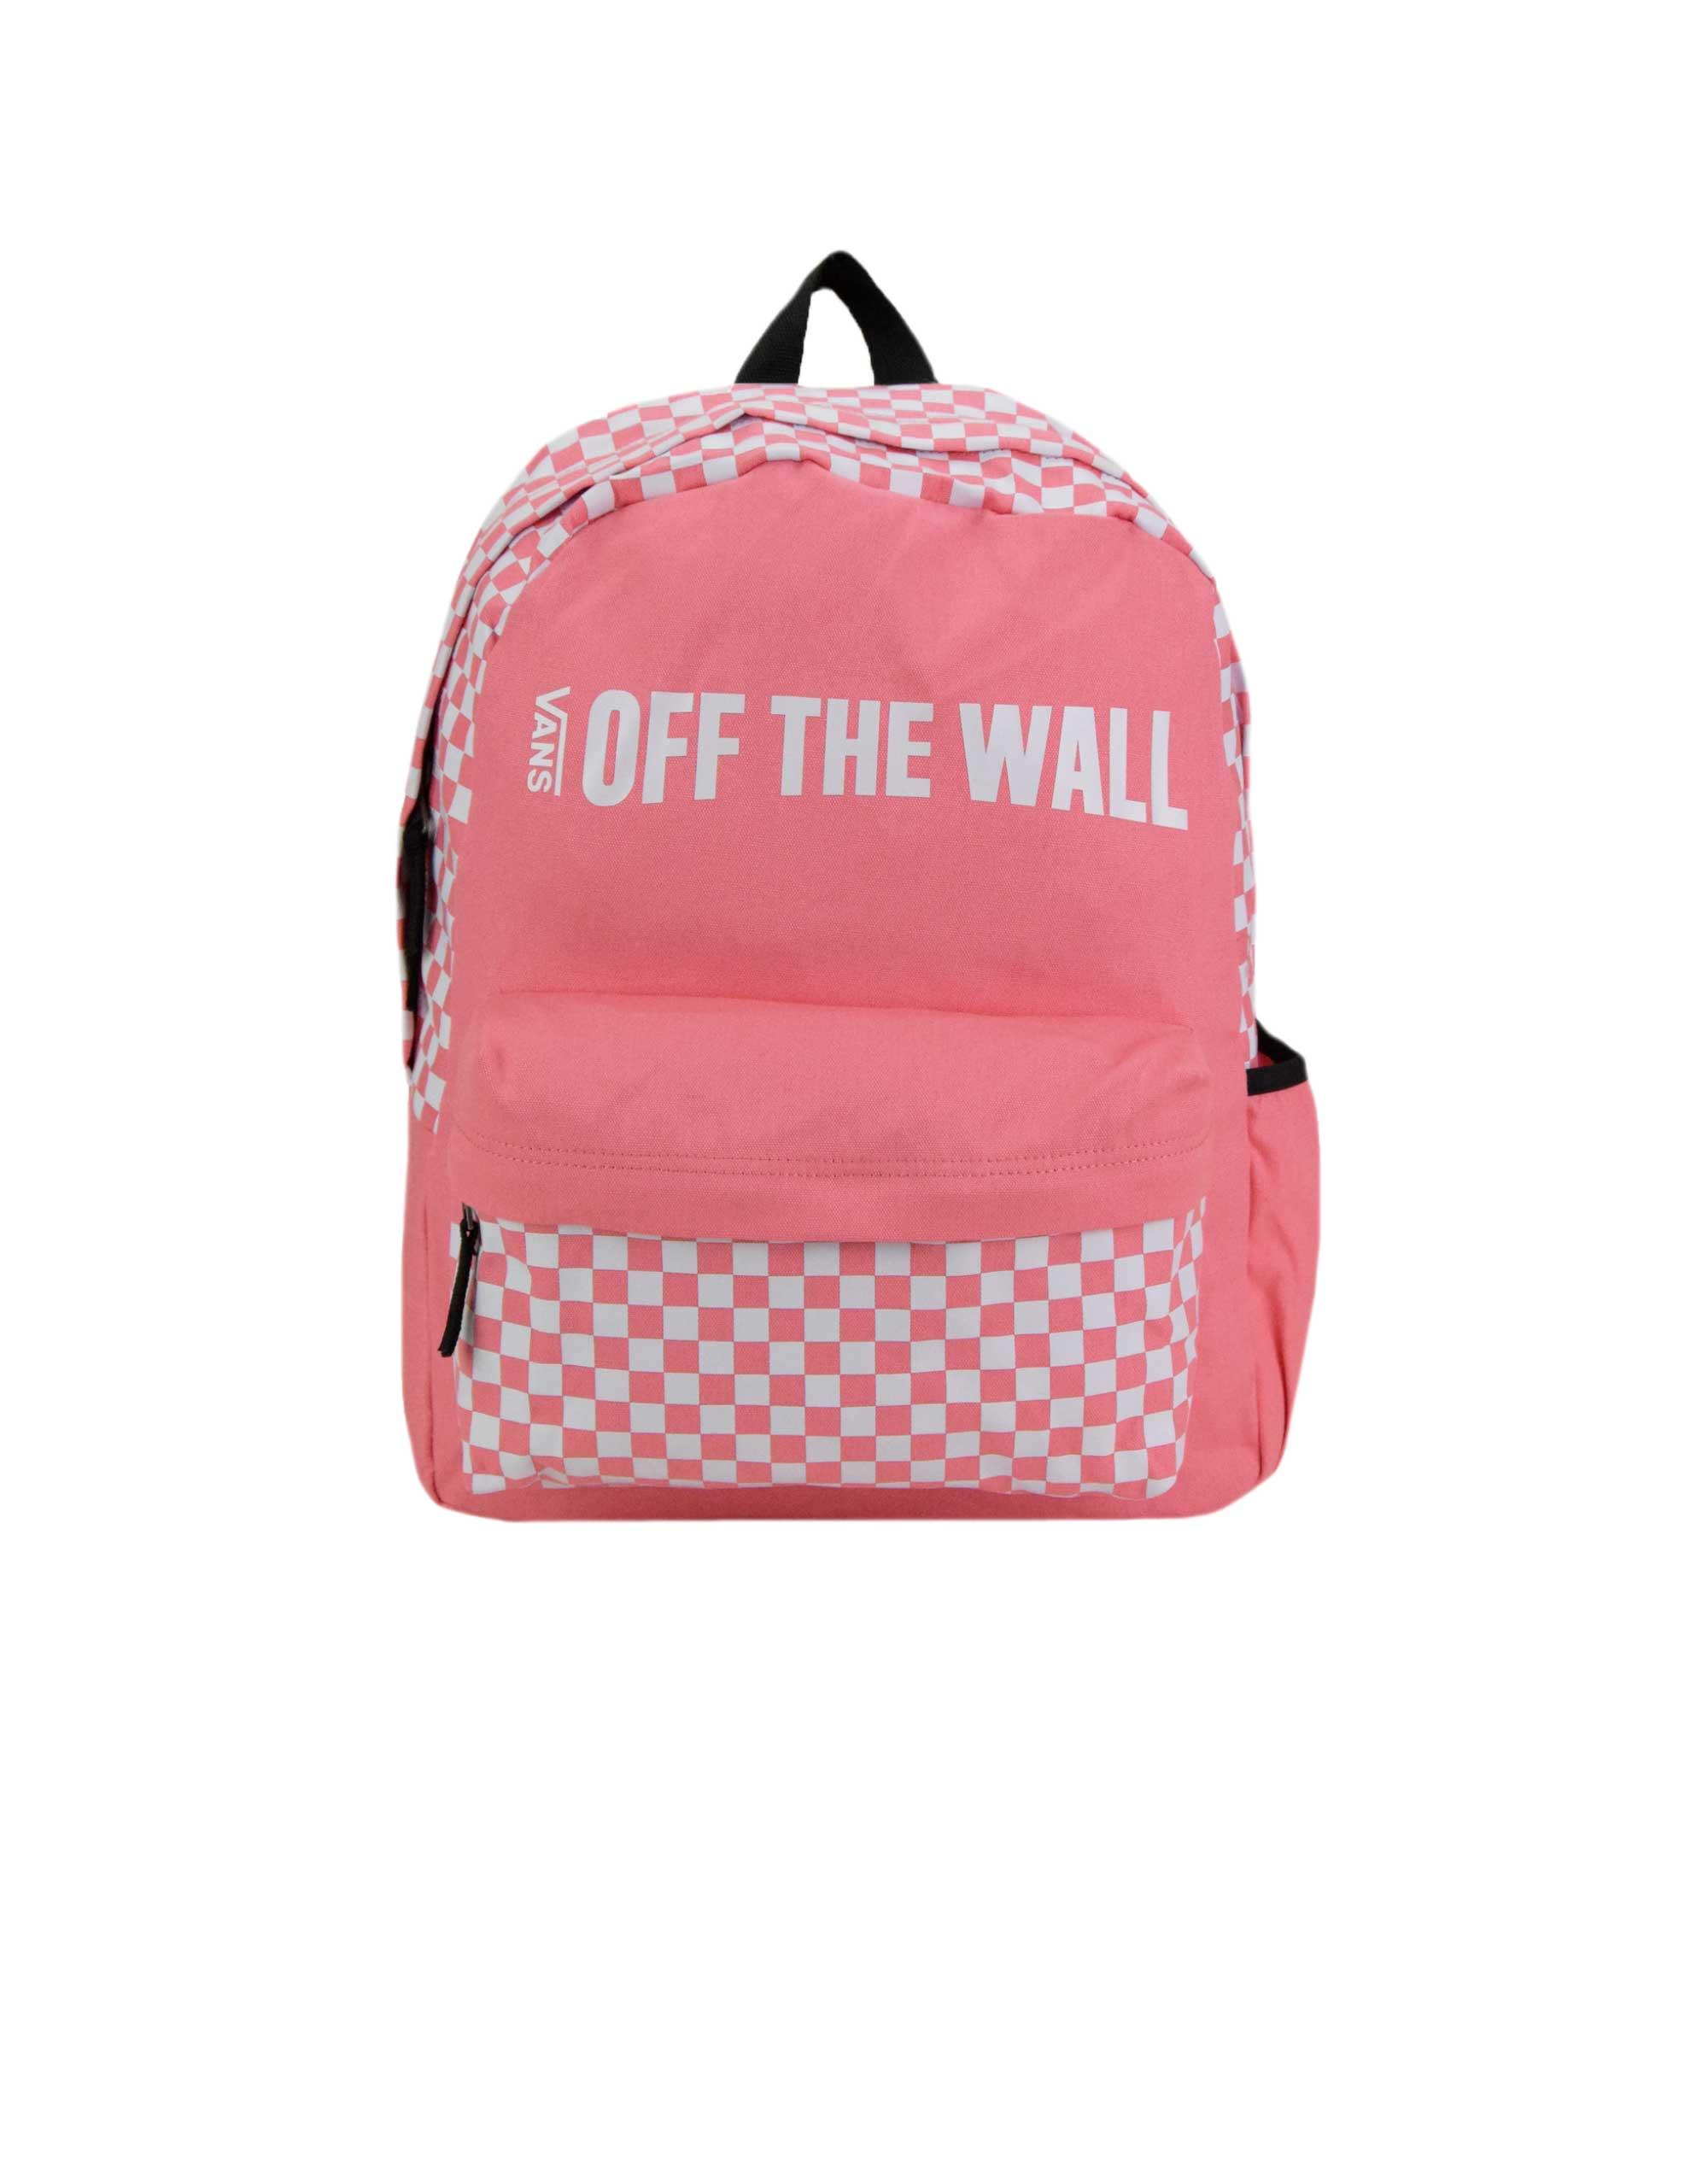 a16e58d31c5a7 Vans Central Realm Backpack (VA3UQSUV6) Strawberry Pink